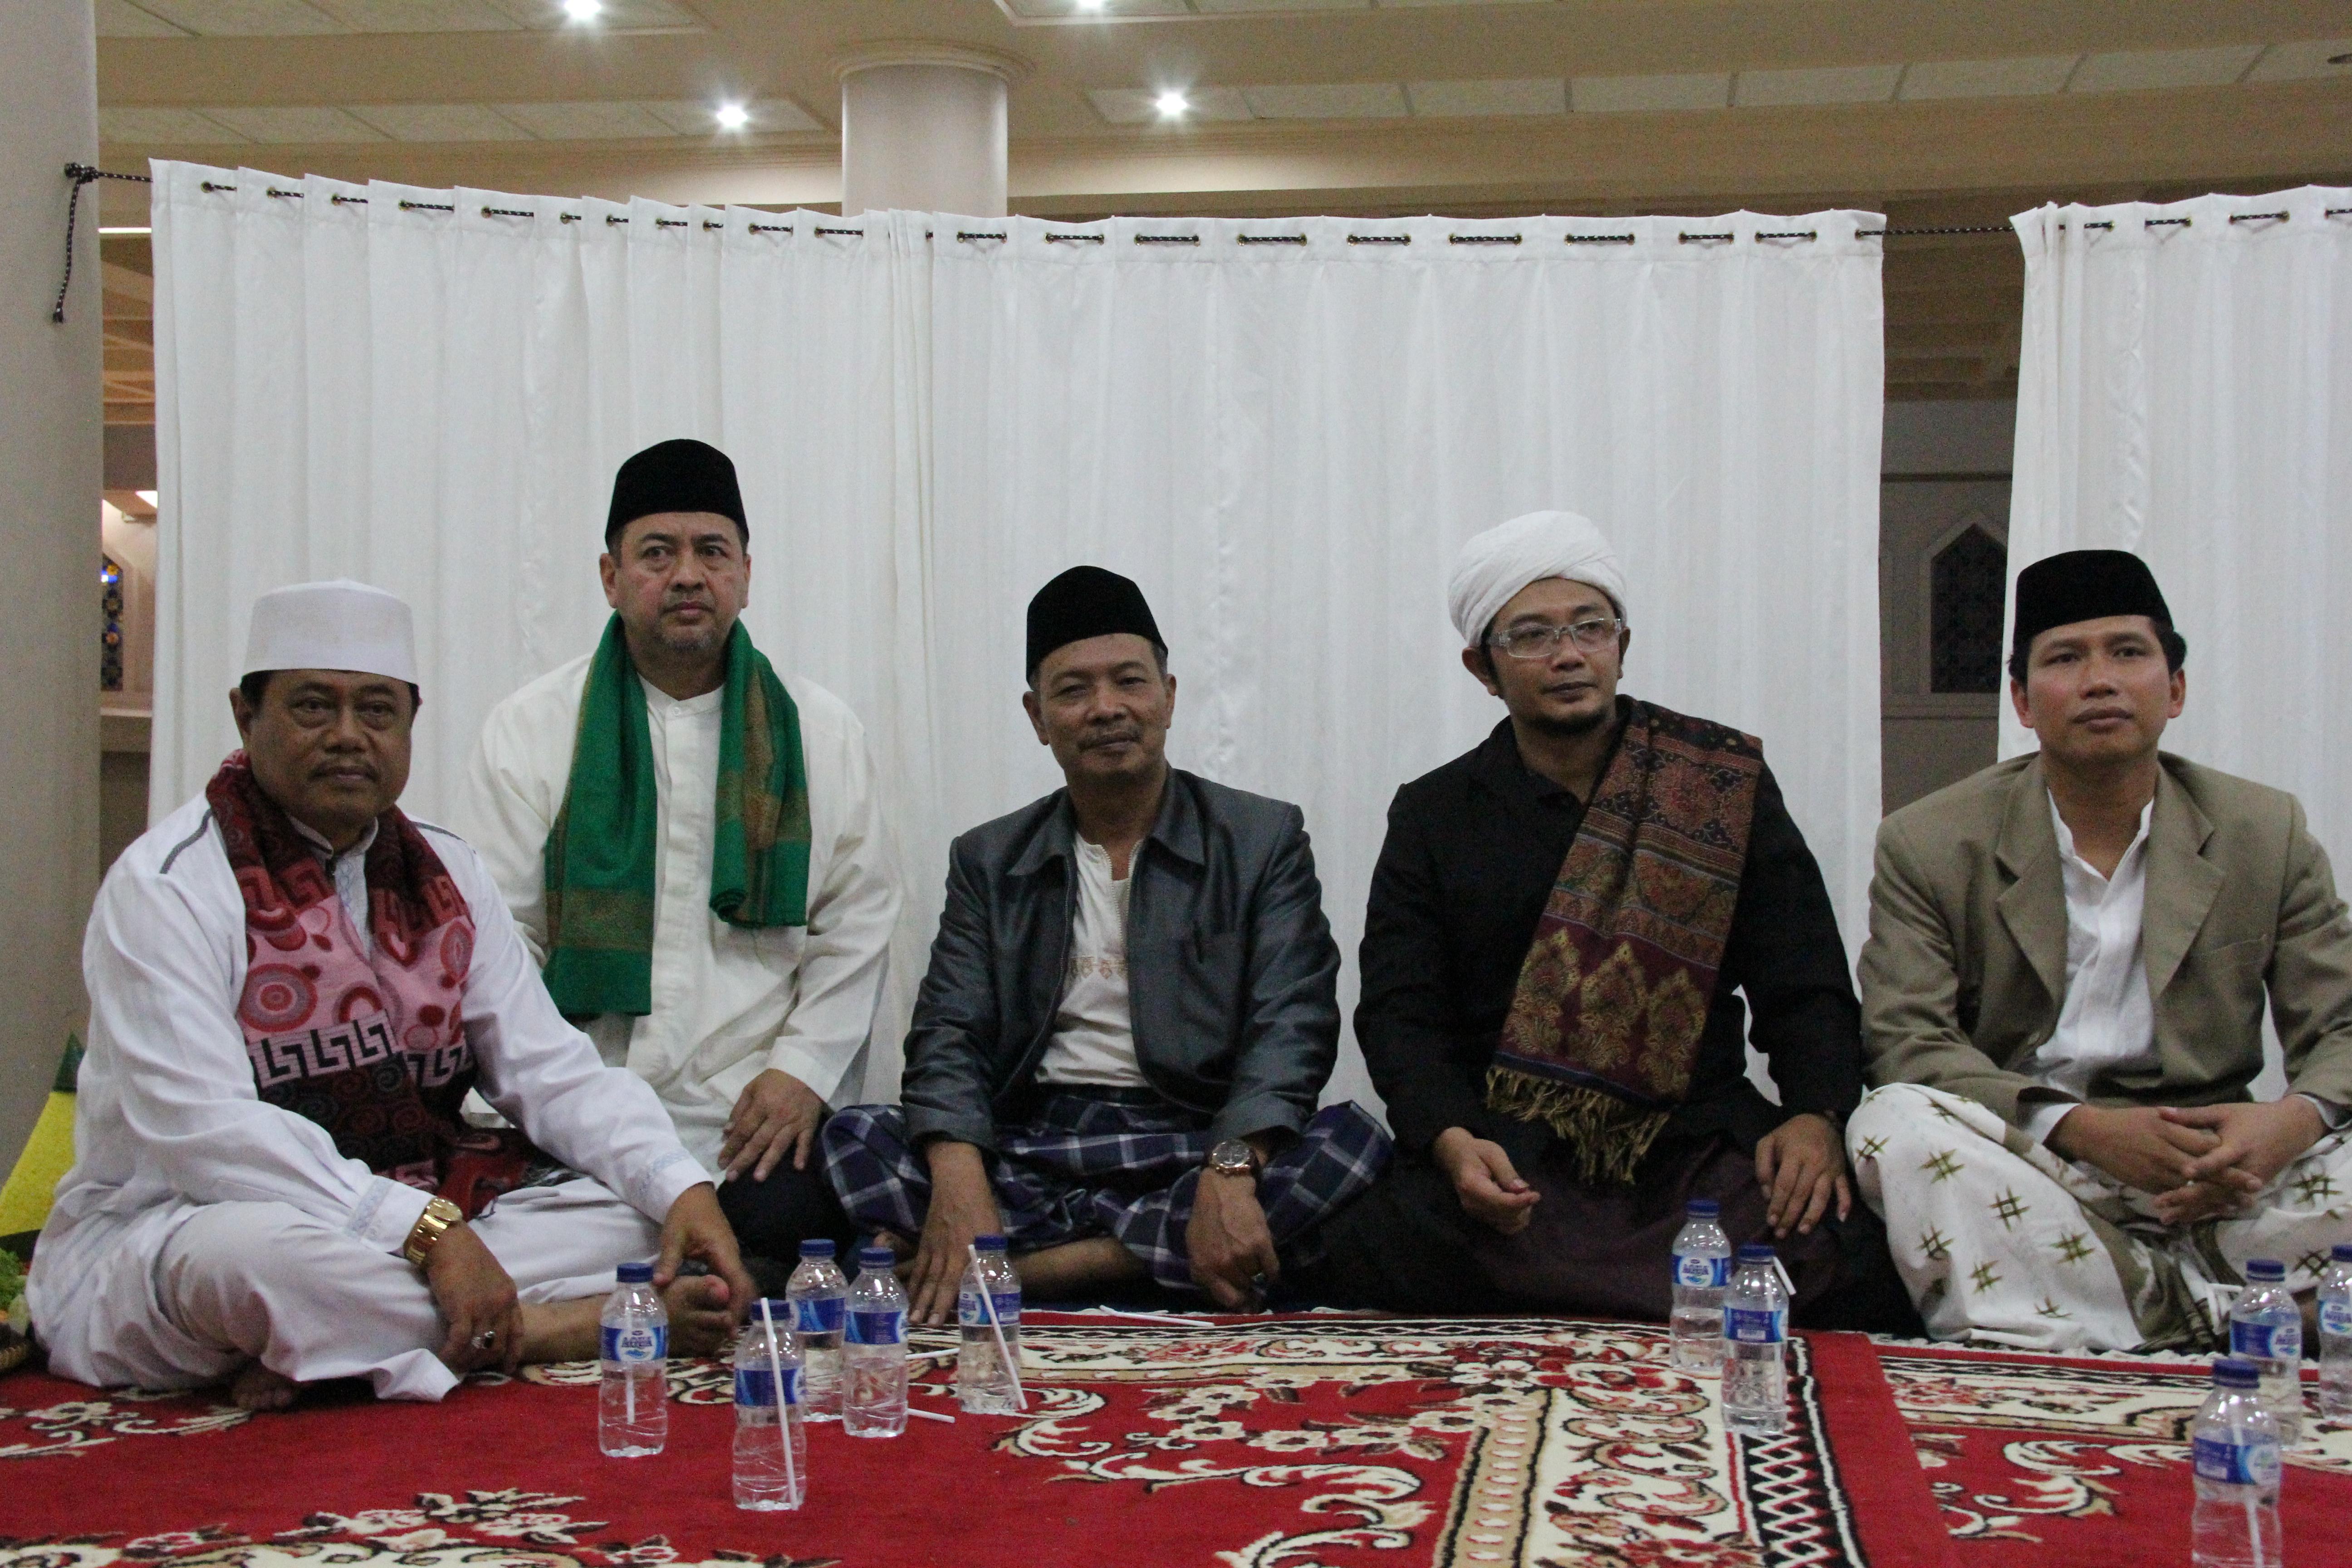 (dua dari kiri) Ustaz Hassan Alaydrus, Ustaz Jalaluddin Rakhmat, dan Kyai Alawi Nurul Alam al Bantani